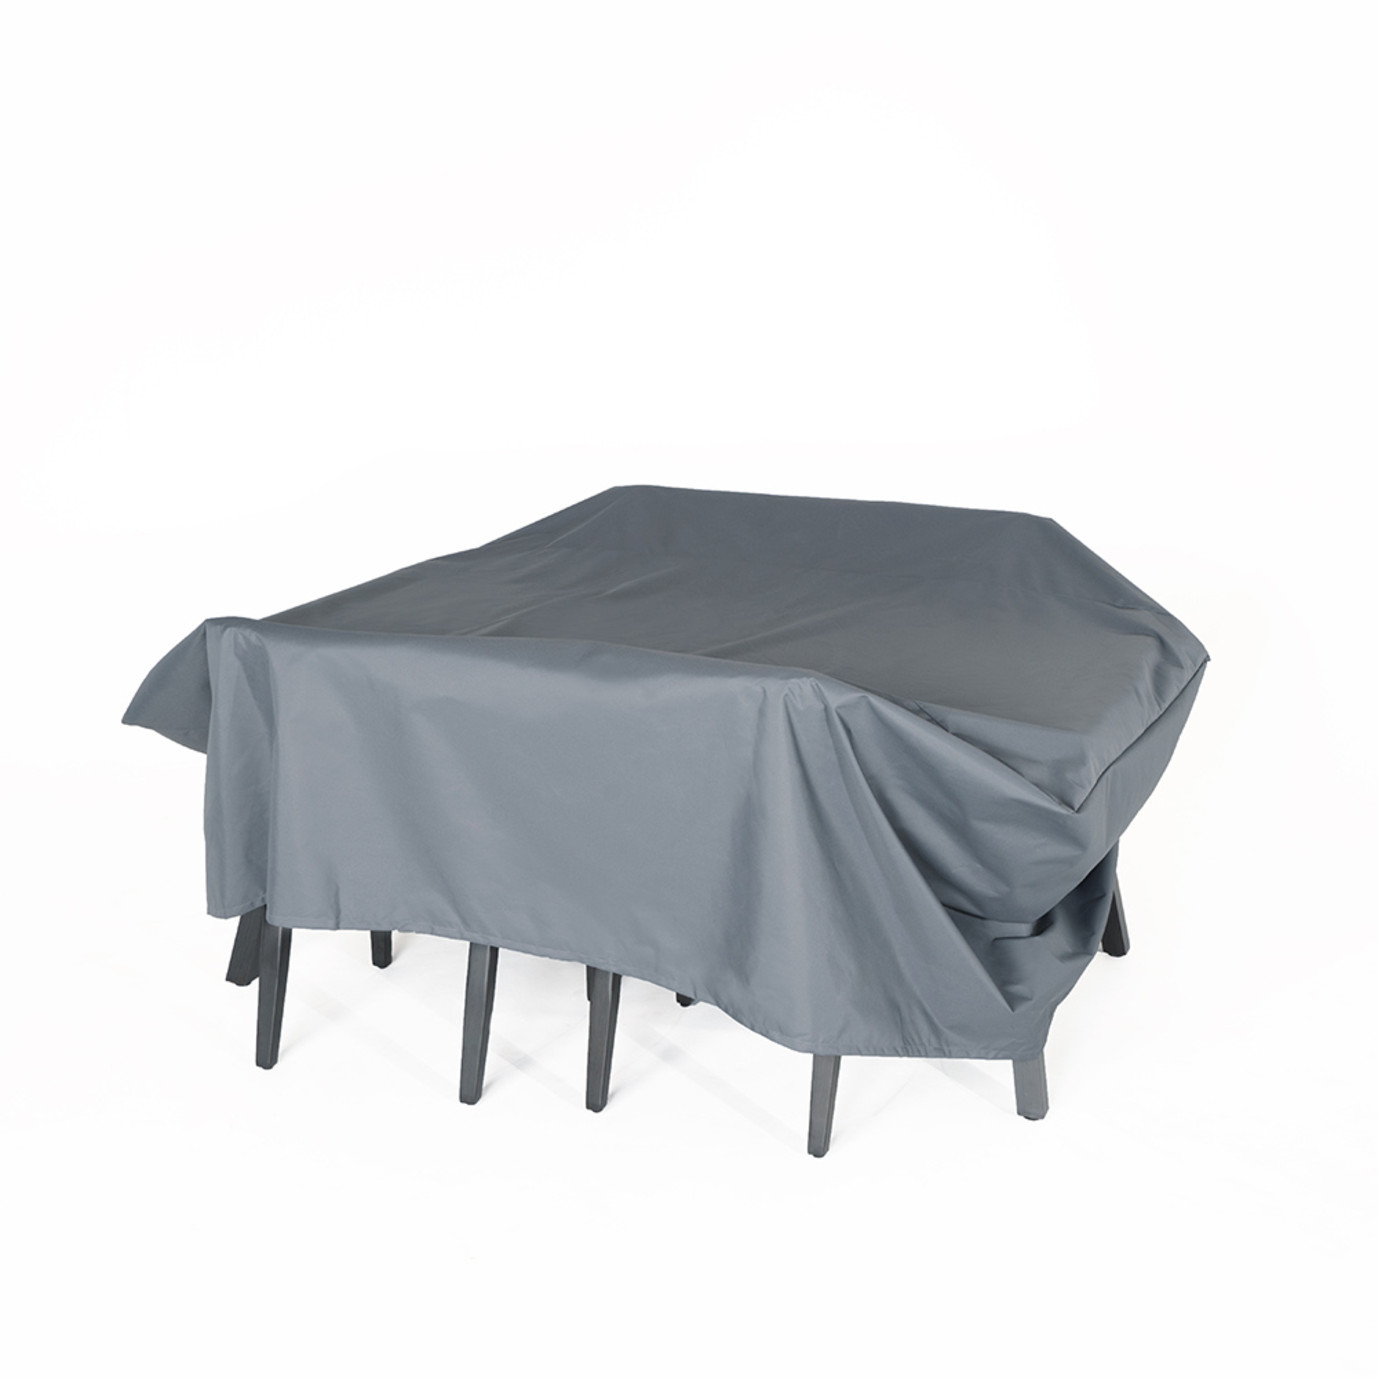 Resort™ 7pc Dining Set Furniture Cover